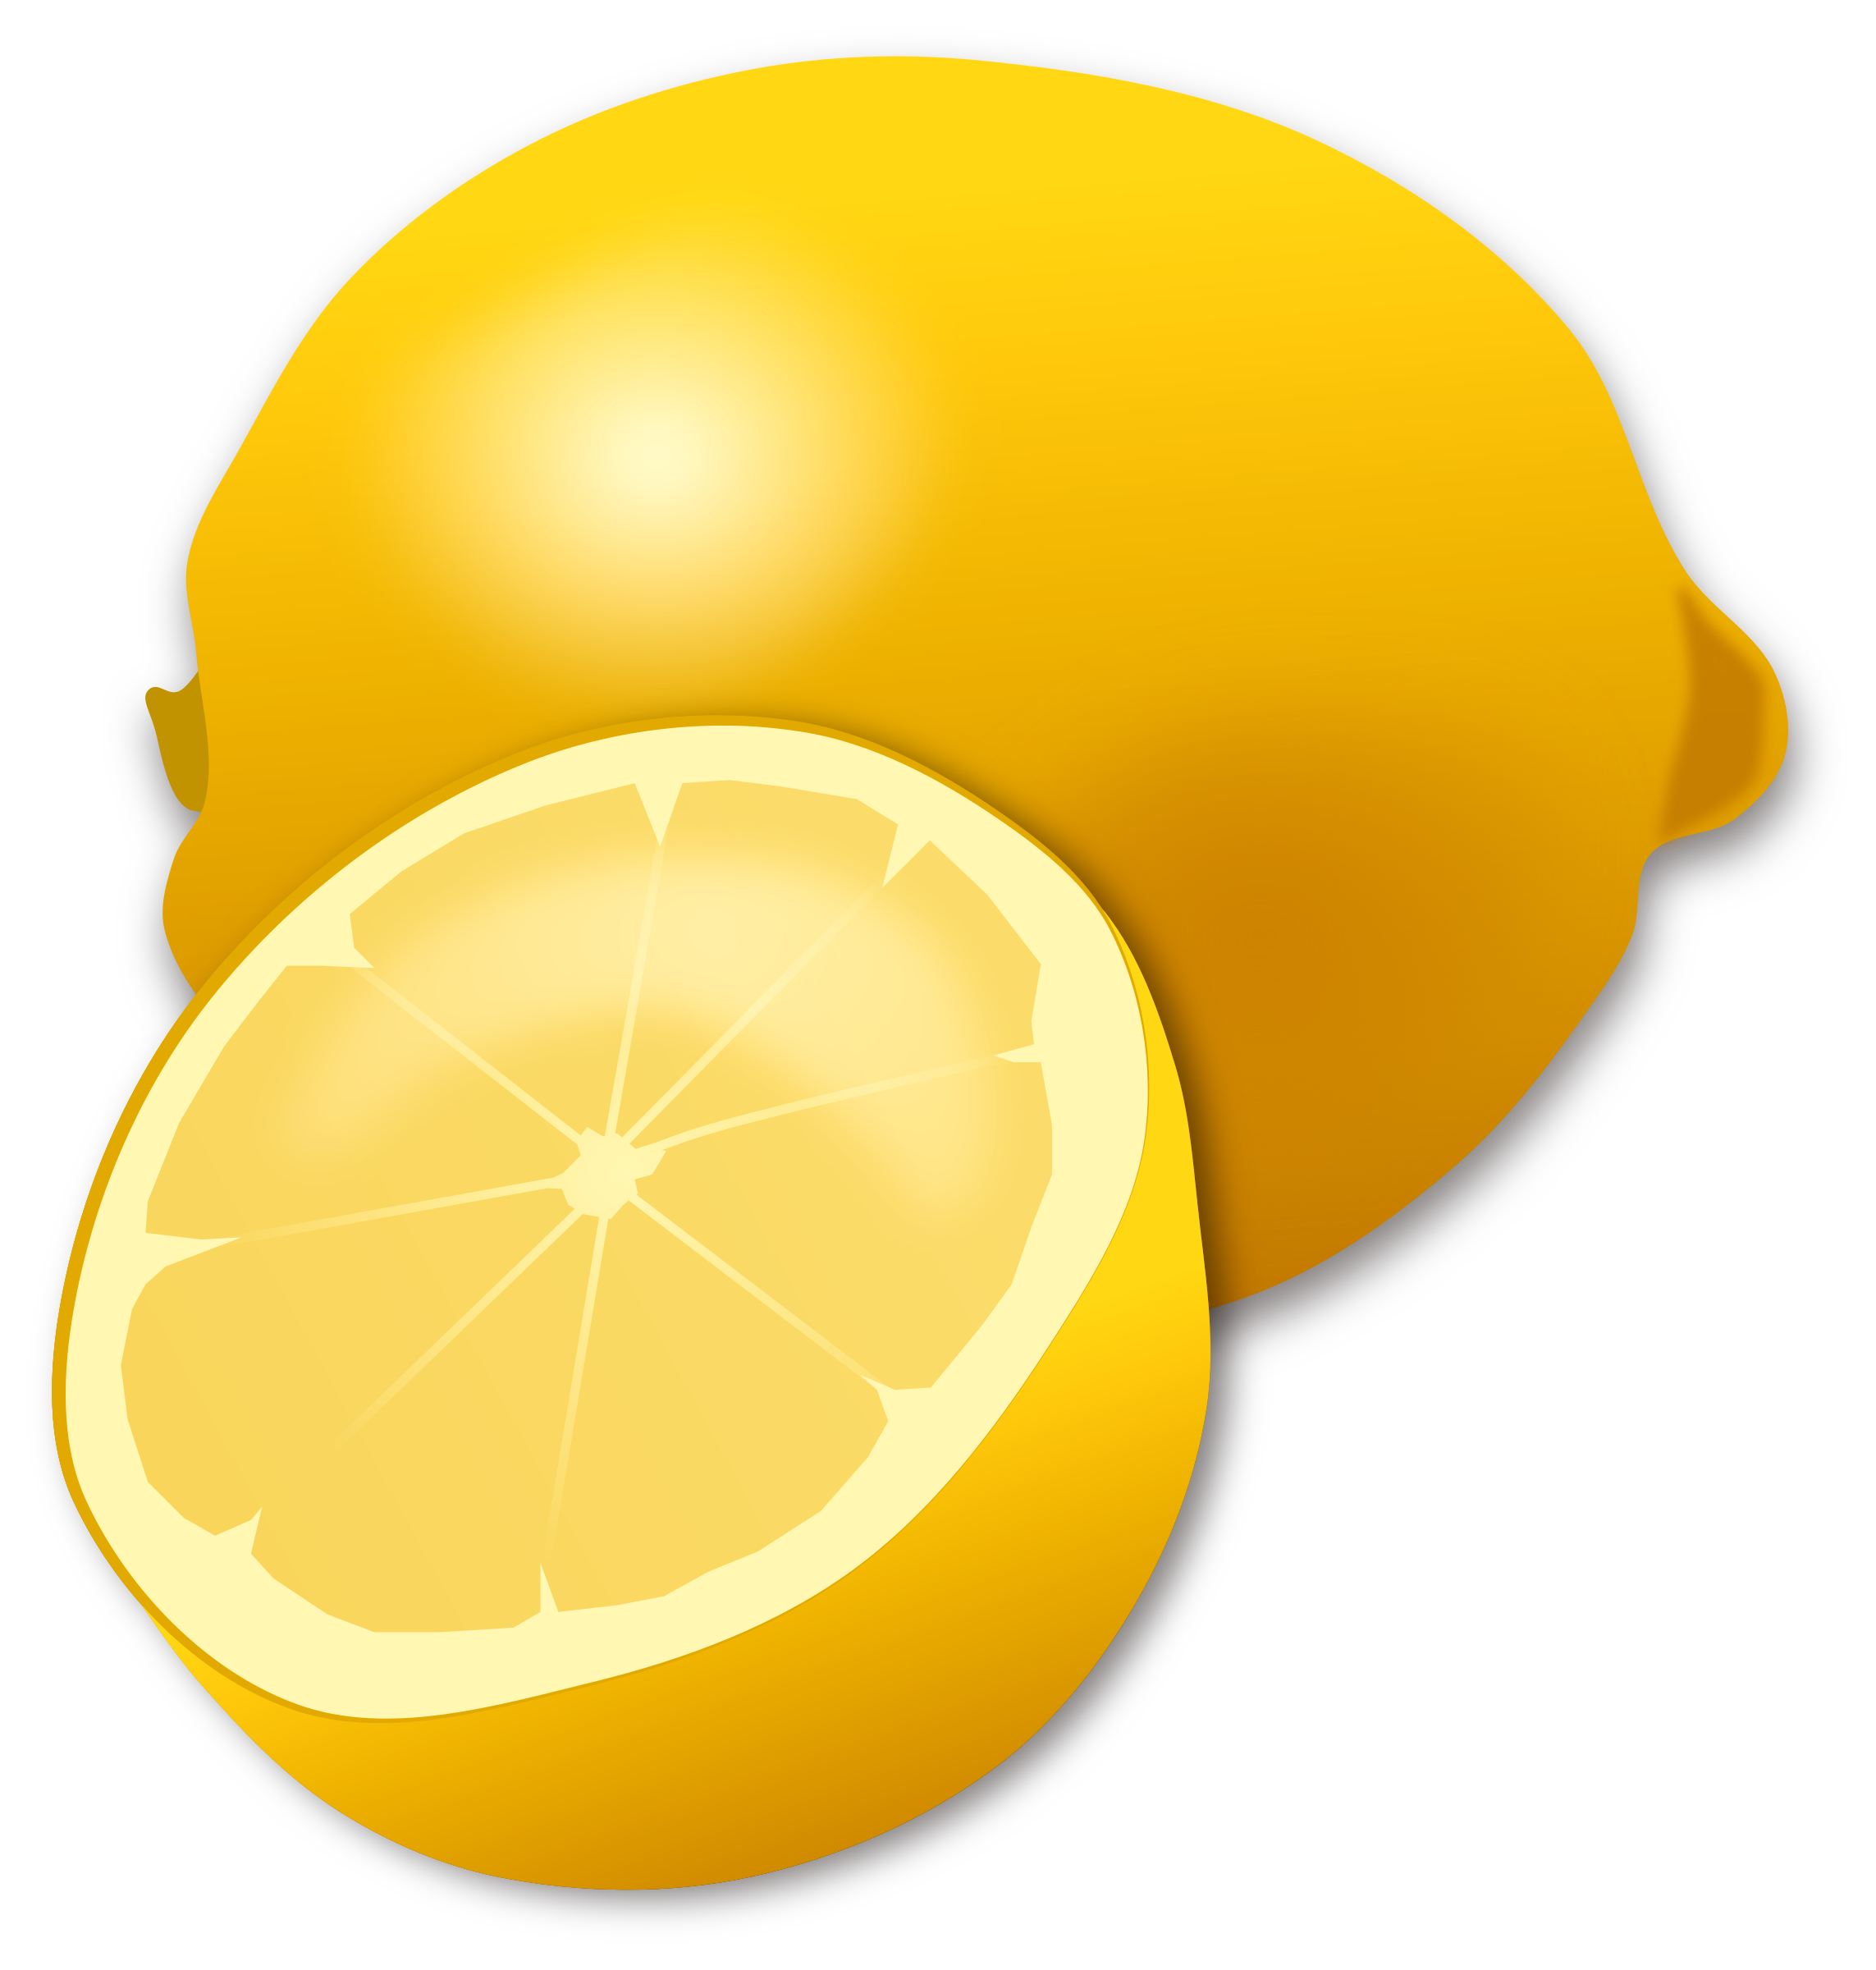 graphic free download Lemon image id png. Lemons clipart file.